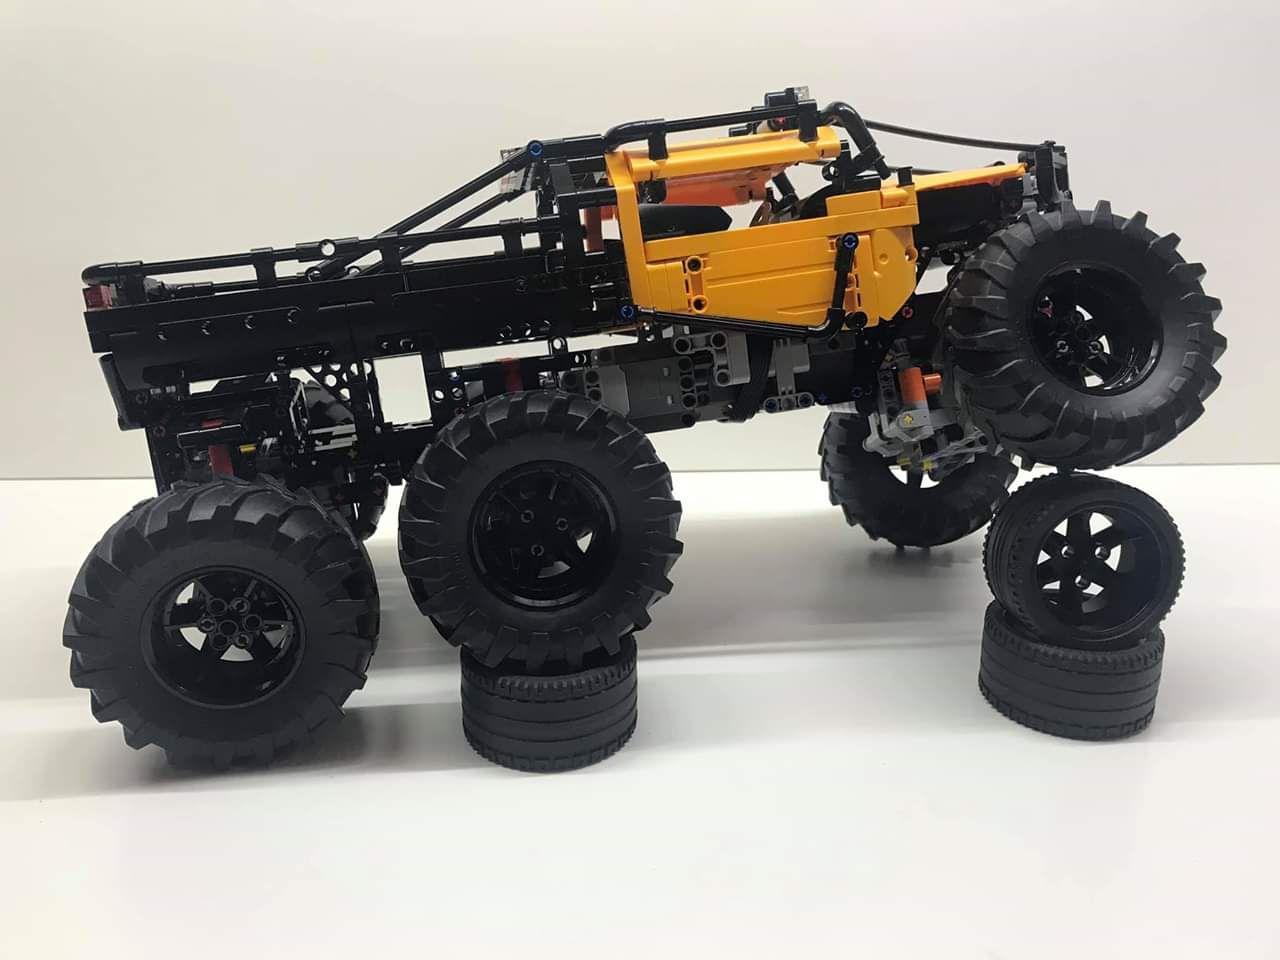 Lego Technic 42099 Moc 6x6 X Treme Off Roader Lego Technic Lego Lego Worlds